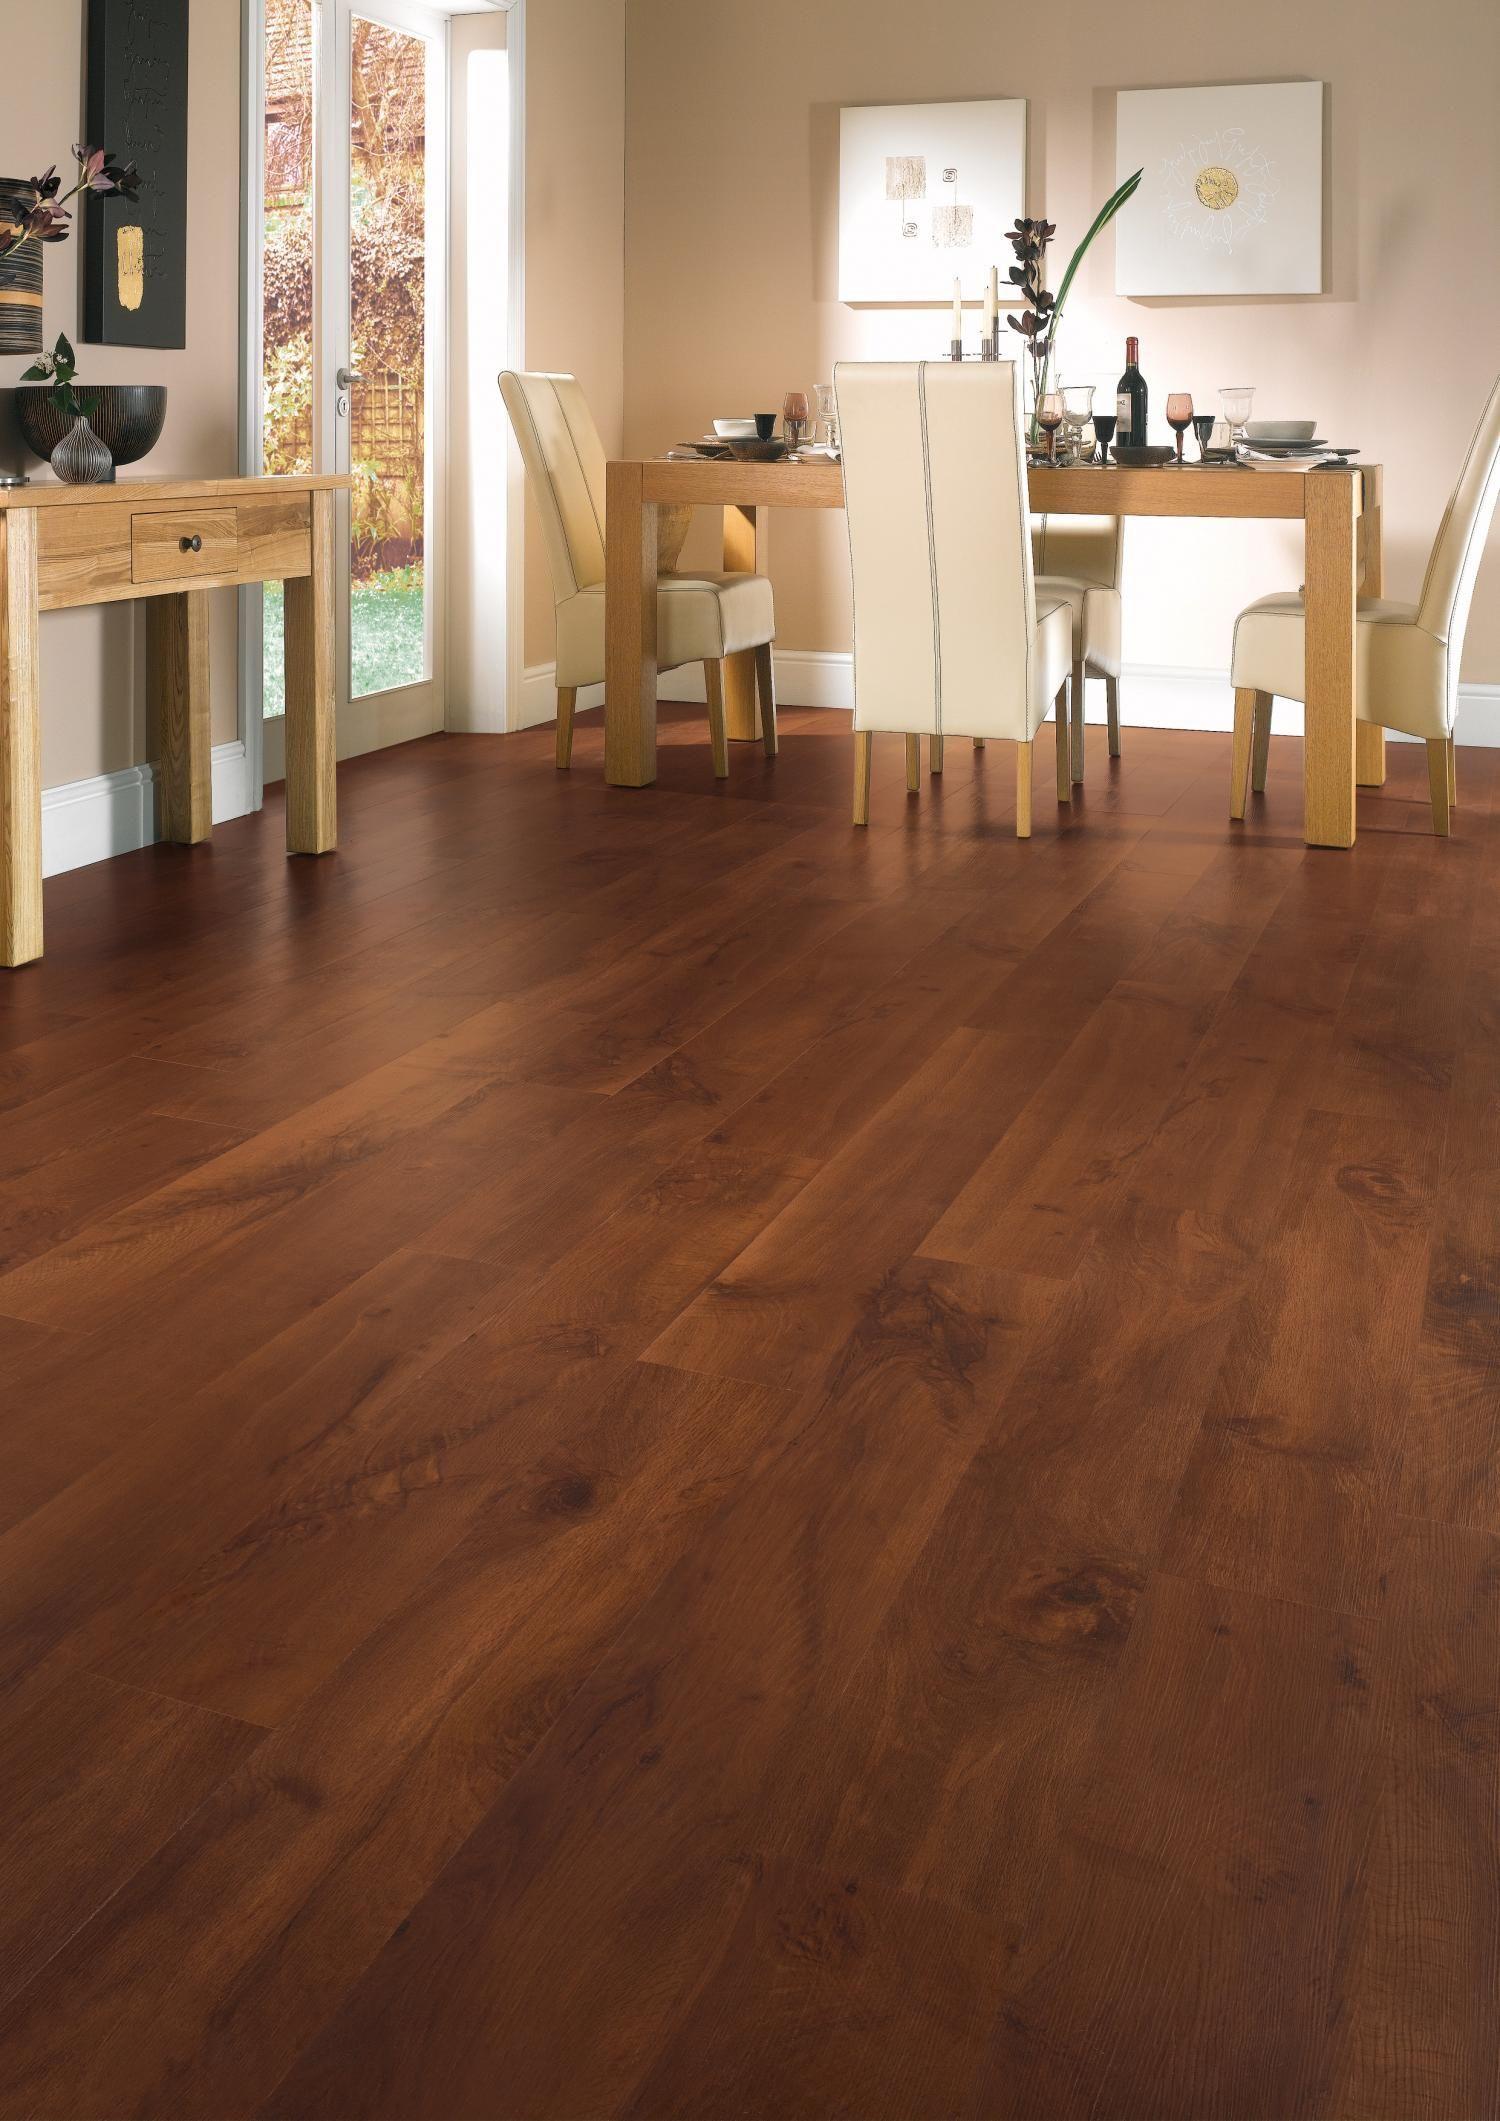 Karndean Vinyl Plank Flooring Prices Smoked Oak Karndean